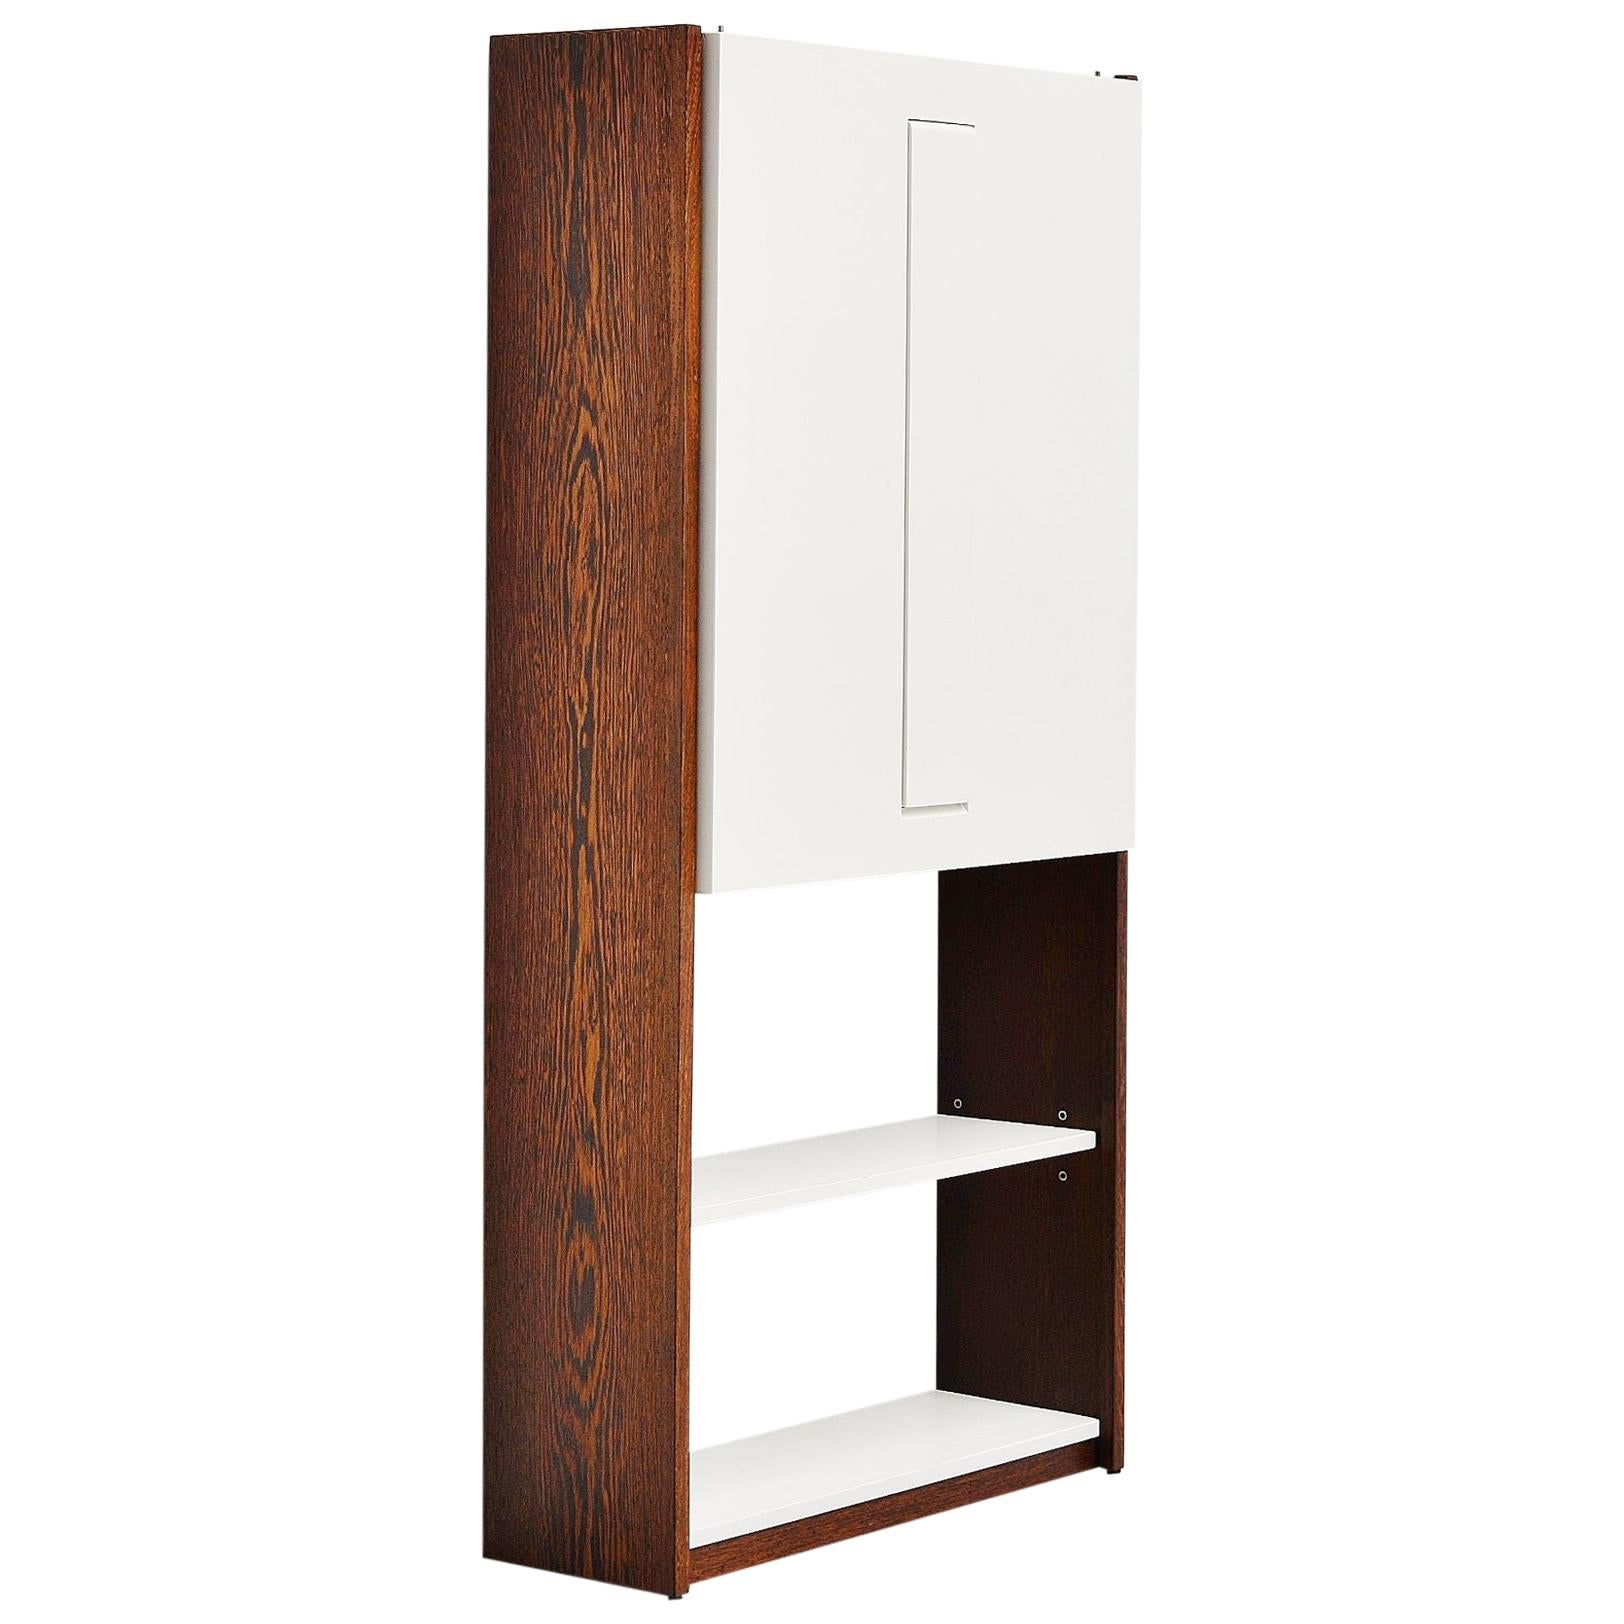 Martin Visser Jos Manders Storage Desk Unit 't Spectrum, 1964